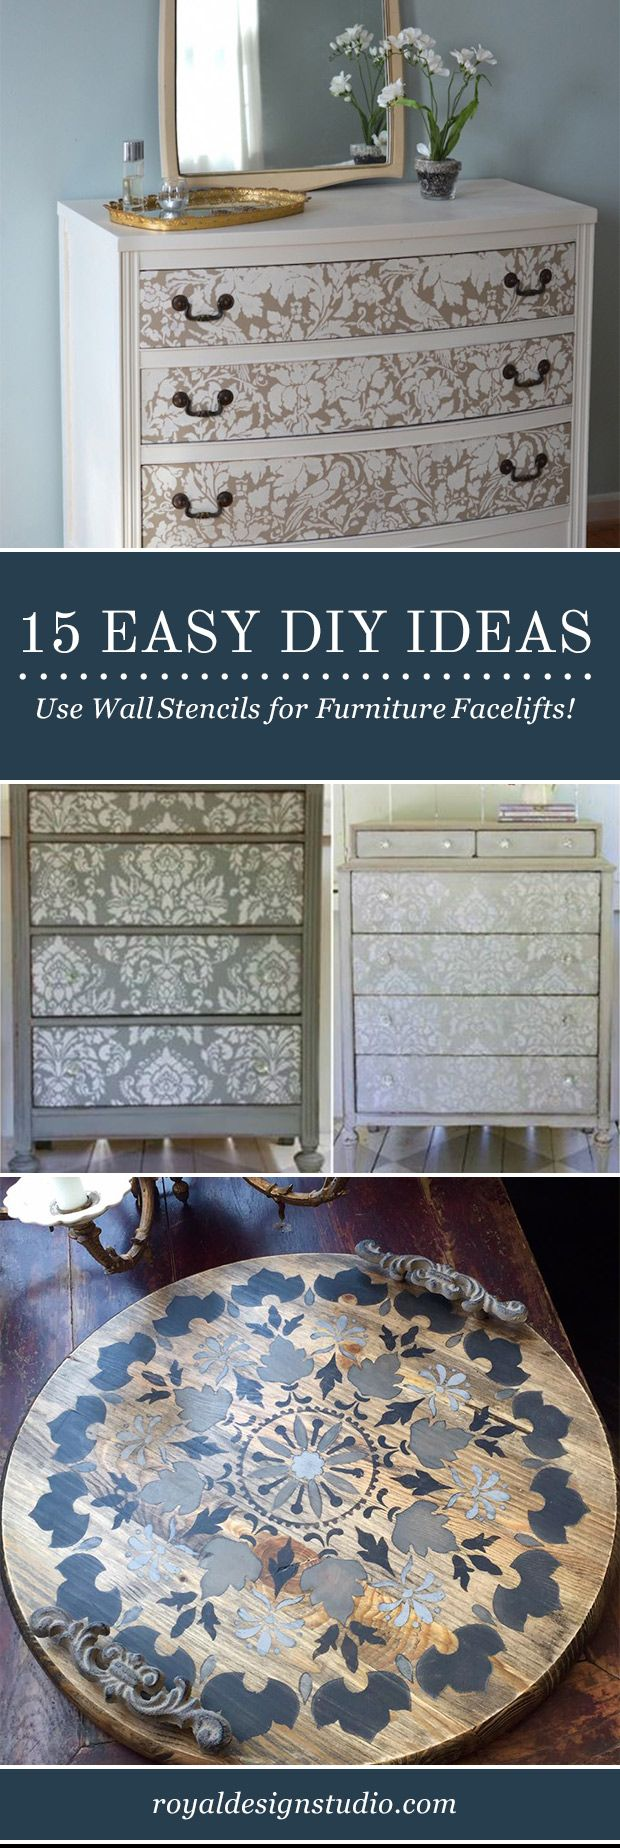 Diy Painted Stencil Bathroom Floor: DIY Decor Ideas: Painting Wall Stencils On Painted